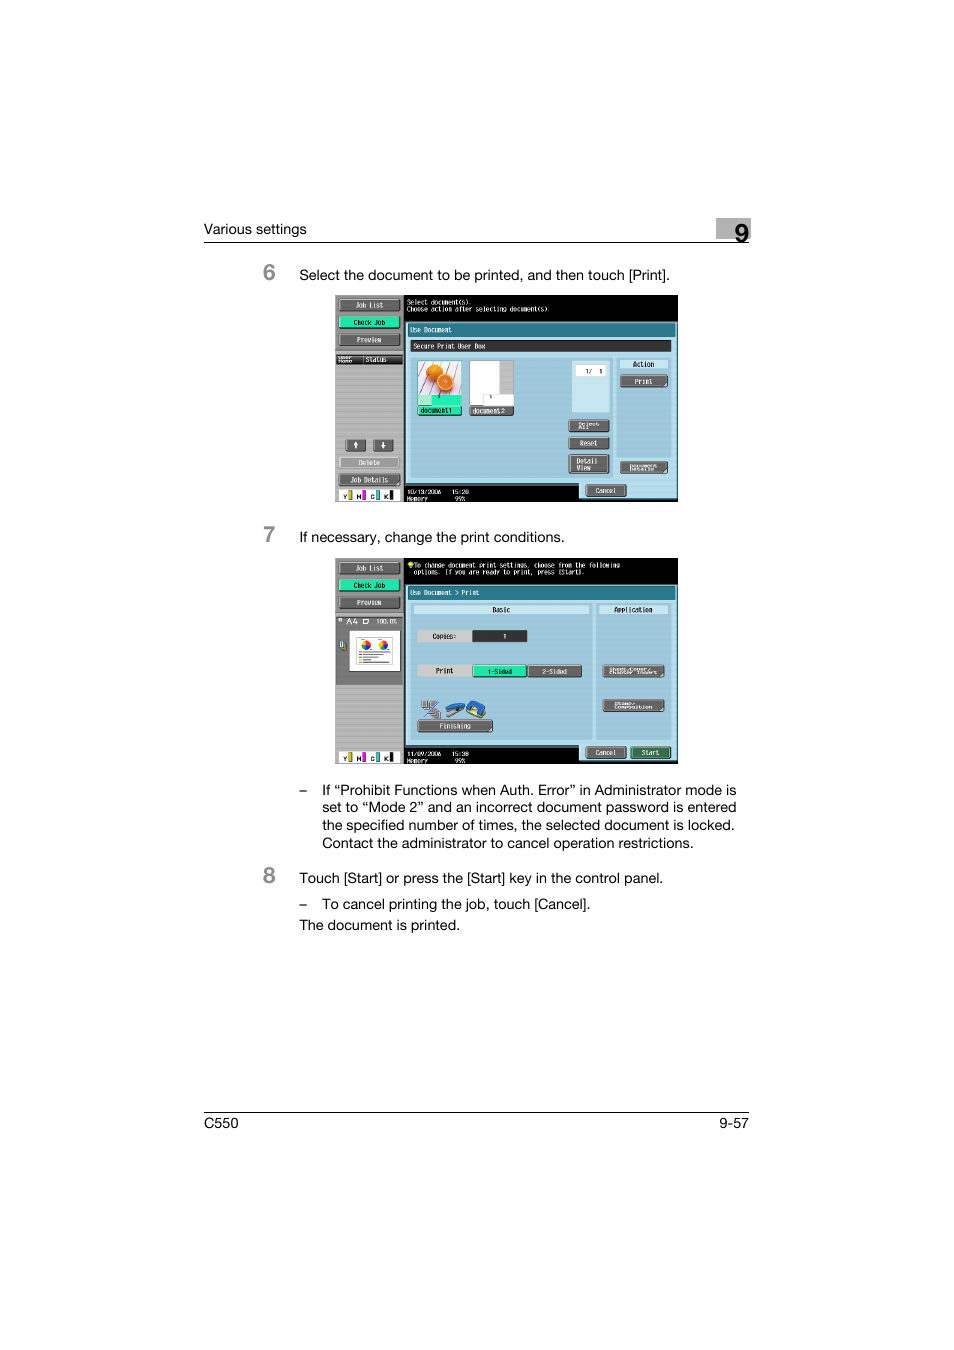 konica minolta bizhub c550 user manual page 366 400 original mode rh manualsdir com bizhub c550 service manual pdf Konica Minolta